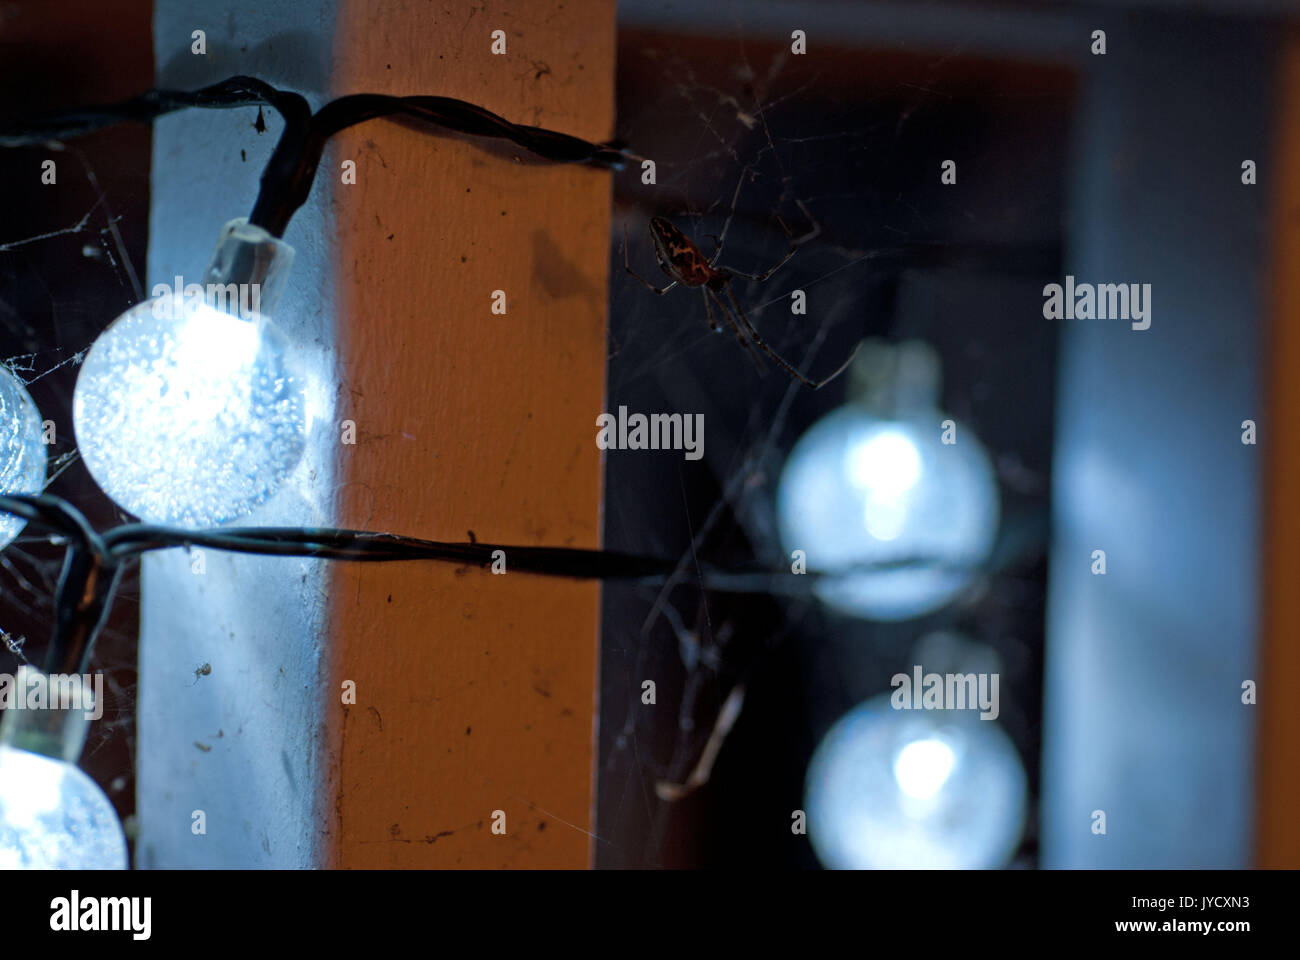 Macro shots of spiderwebs built on bluish sphere string lights - Stock Image